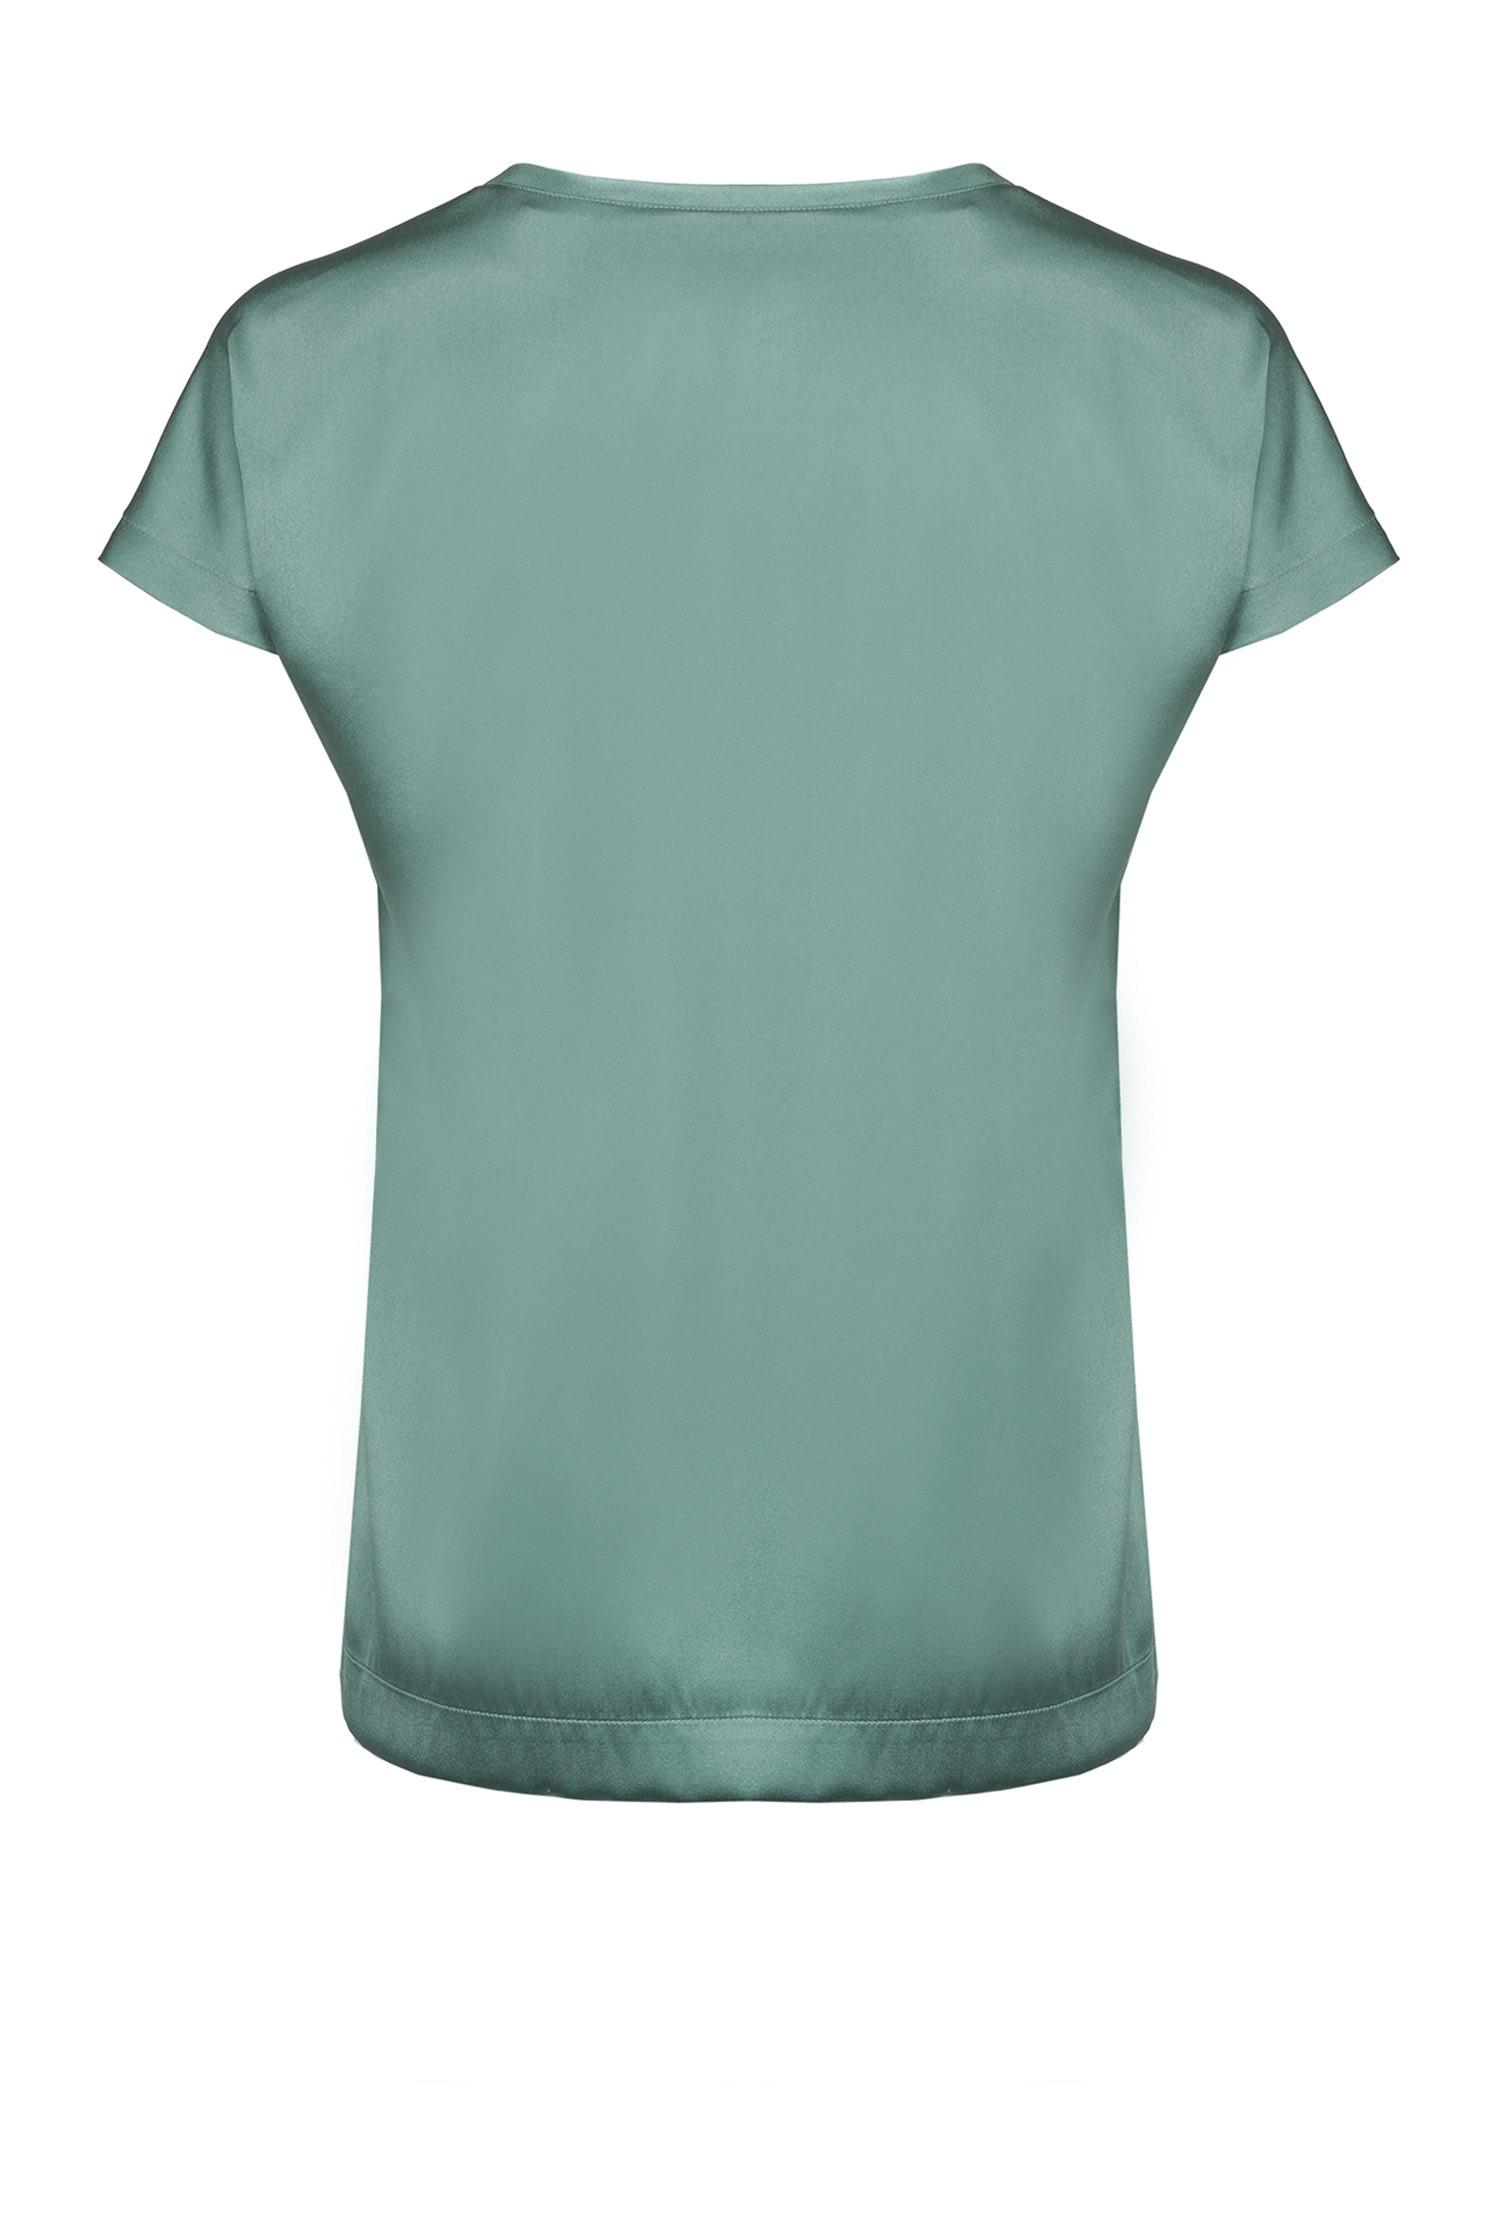 Pinko Shirt smaragd